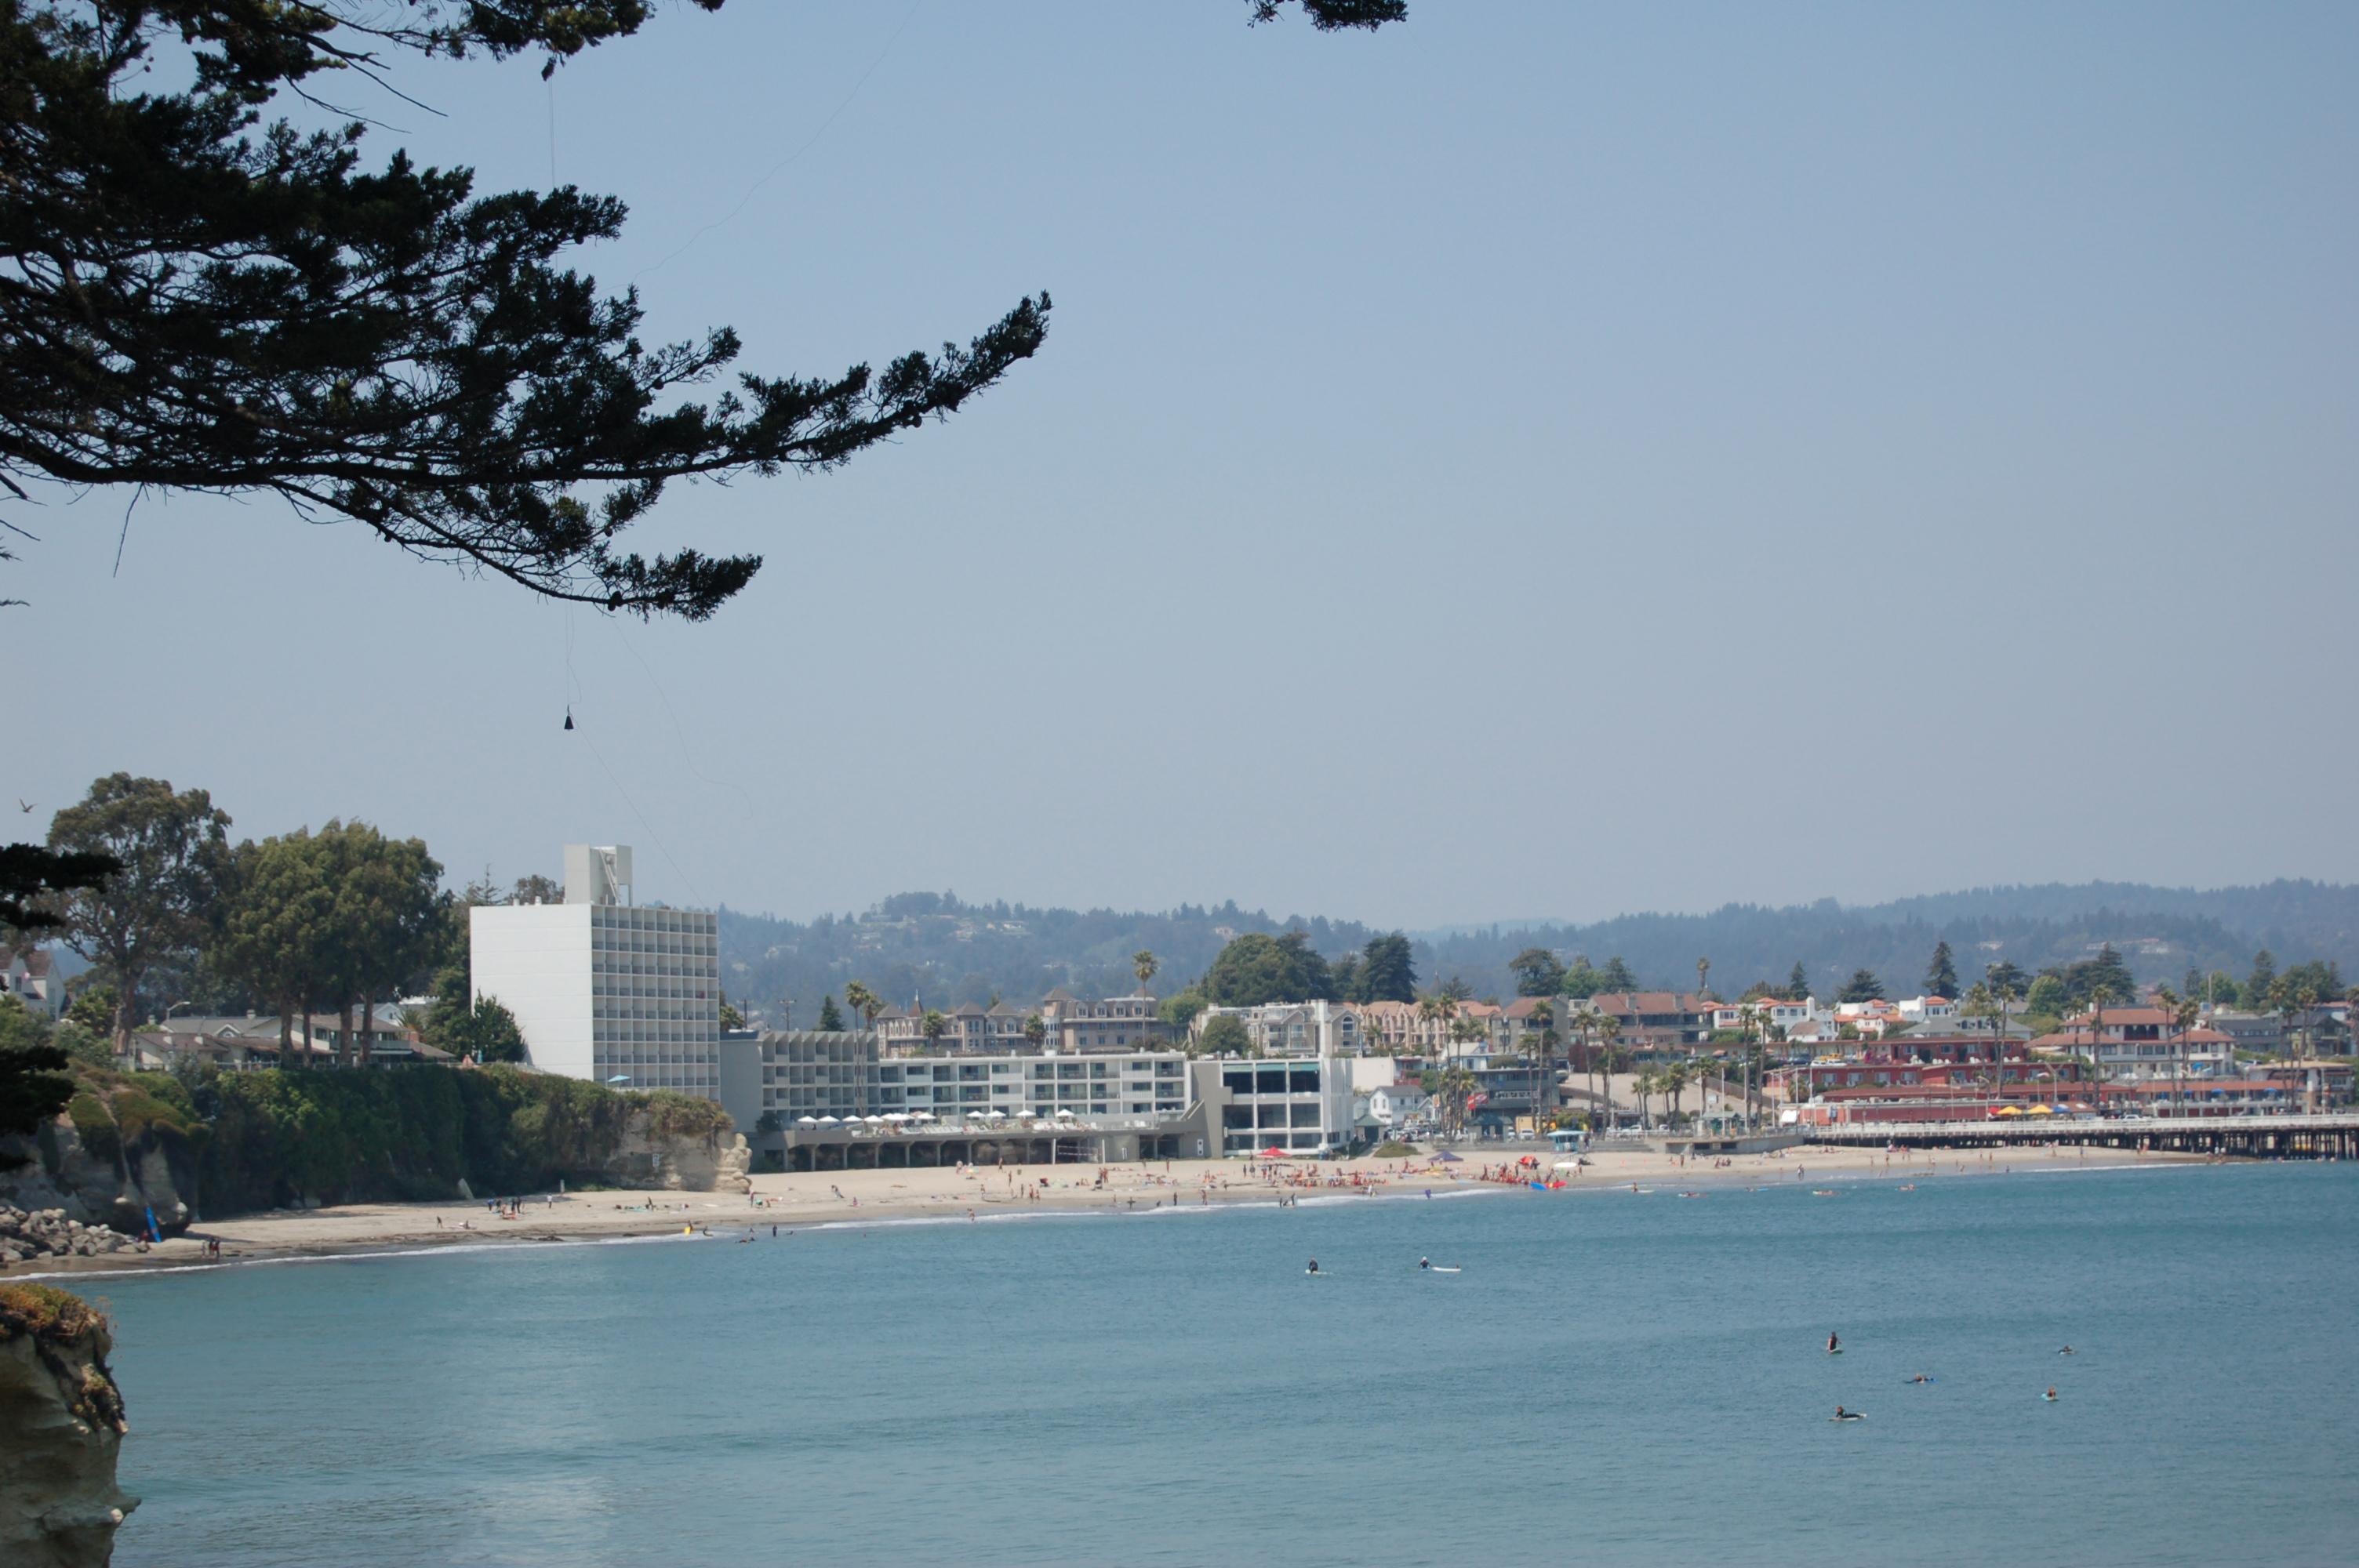 Cowells Beach Ca